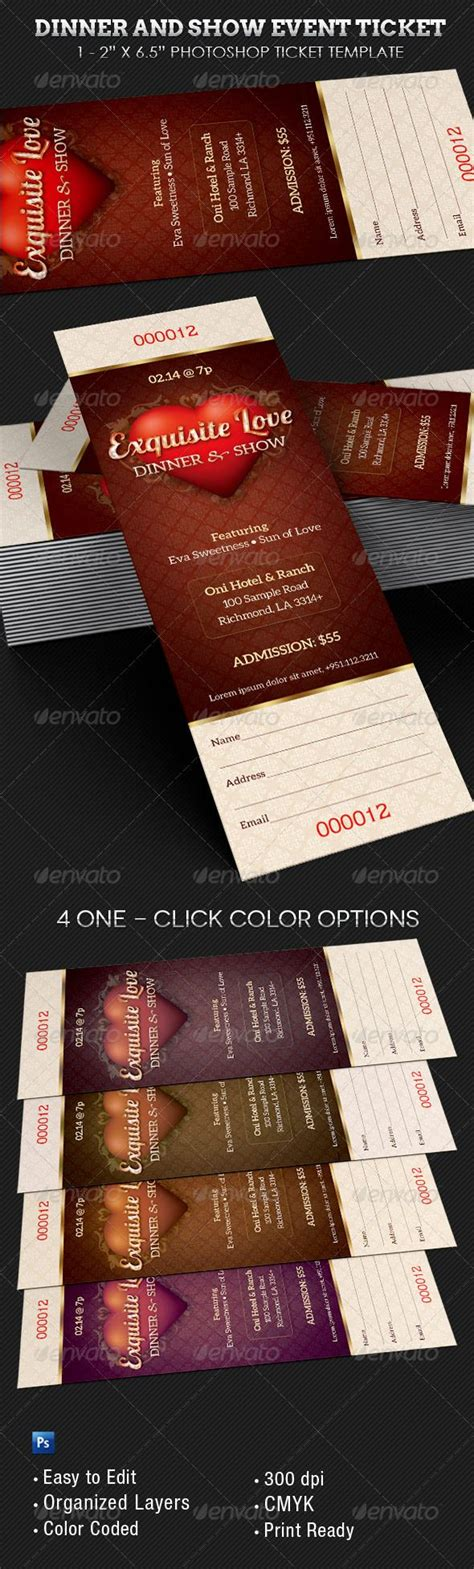 14 event ticket templates excel pdf formats